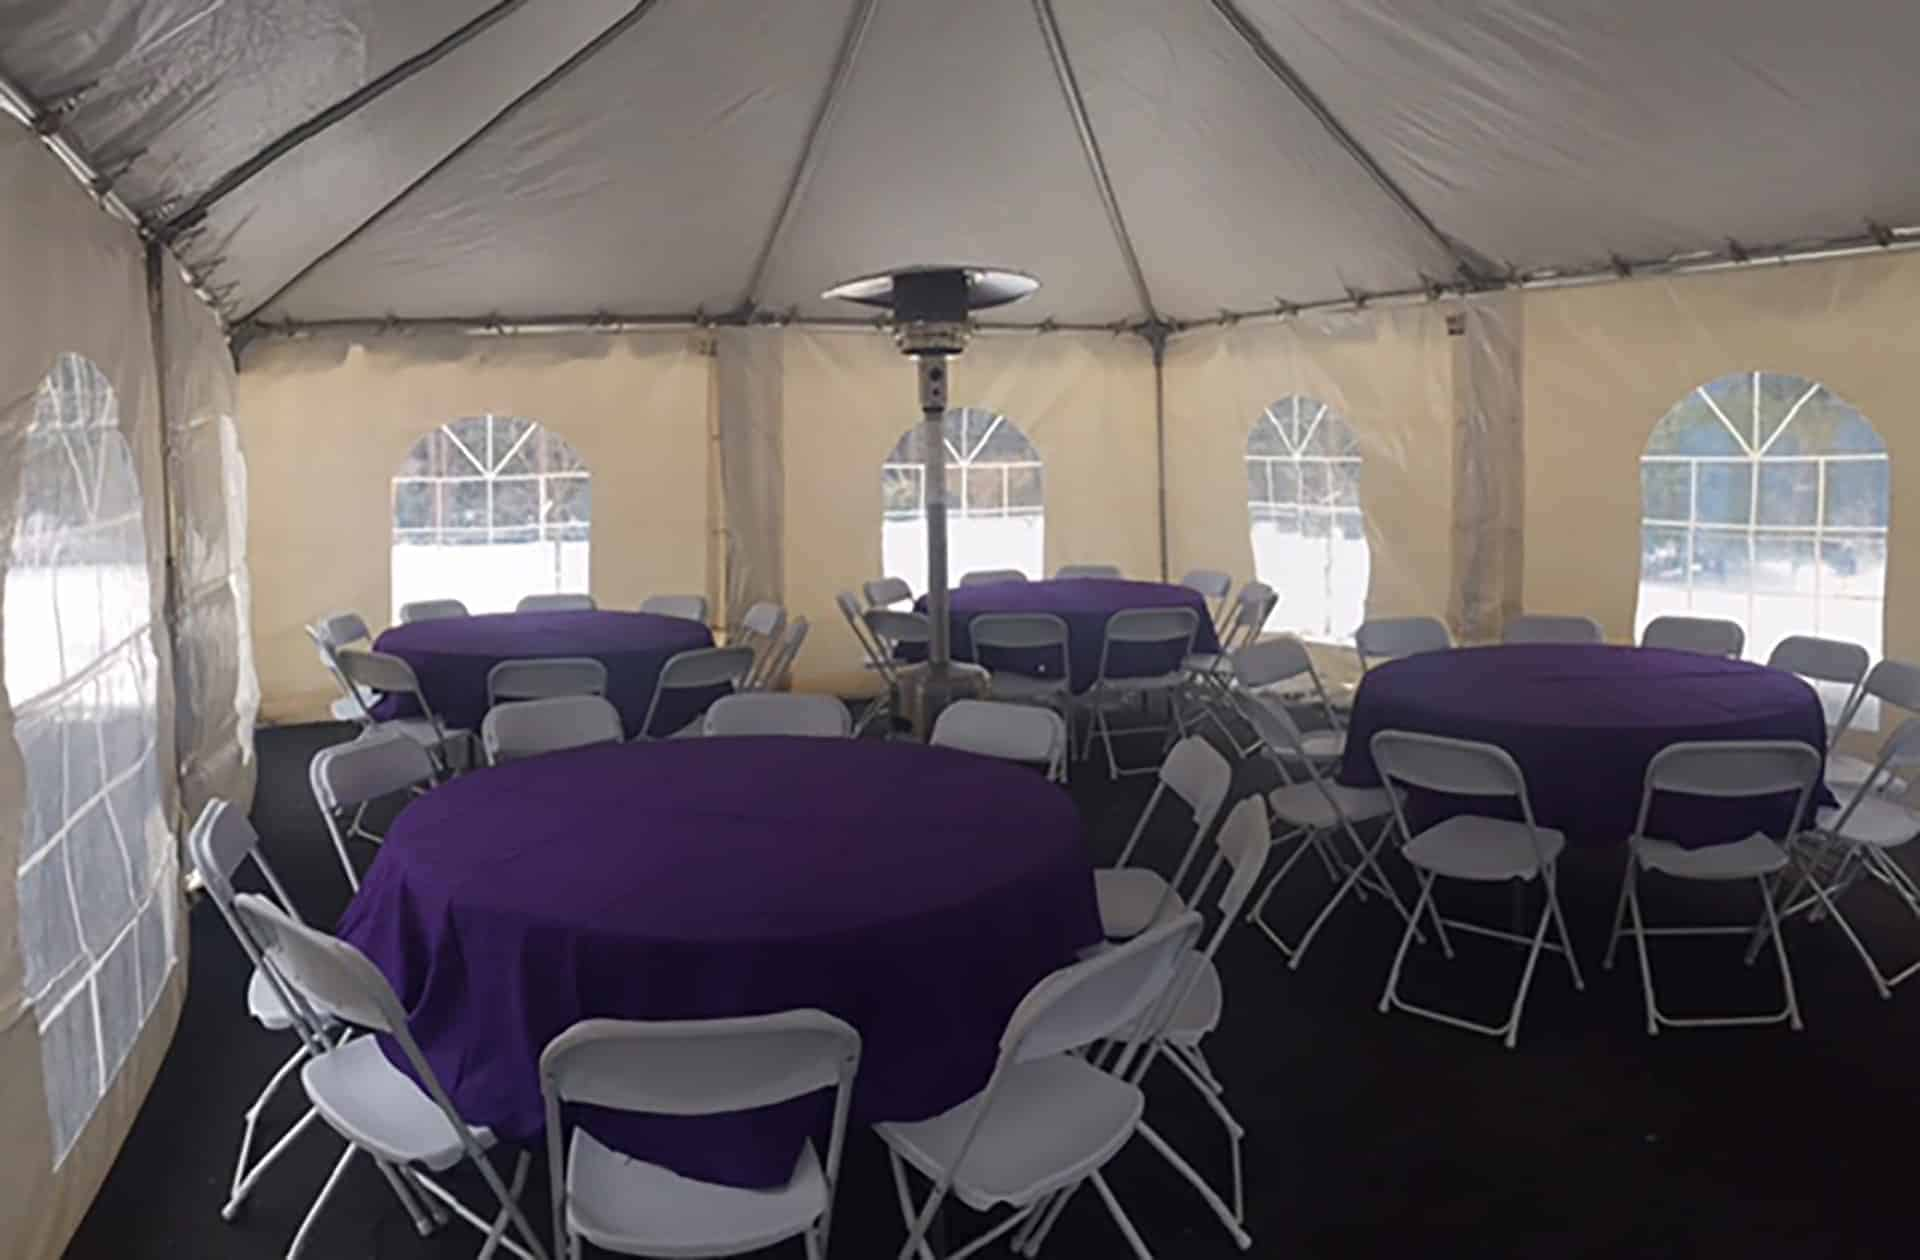 purple linen heated tent rental